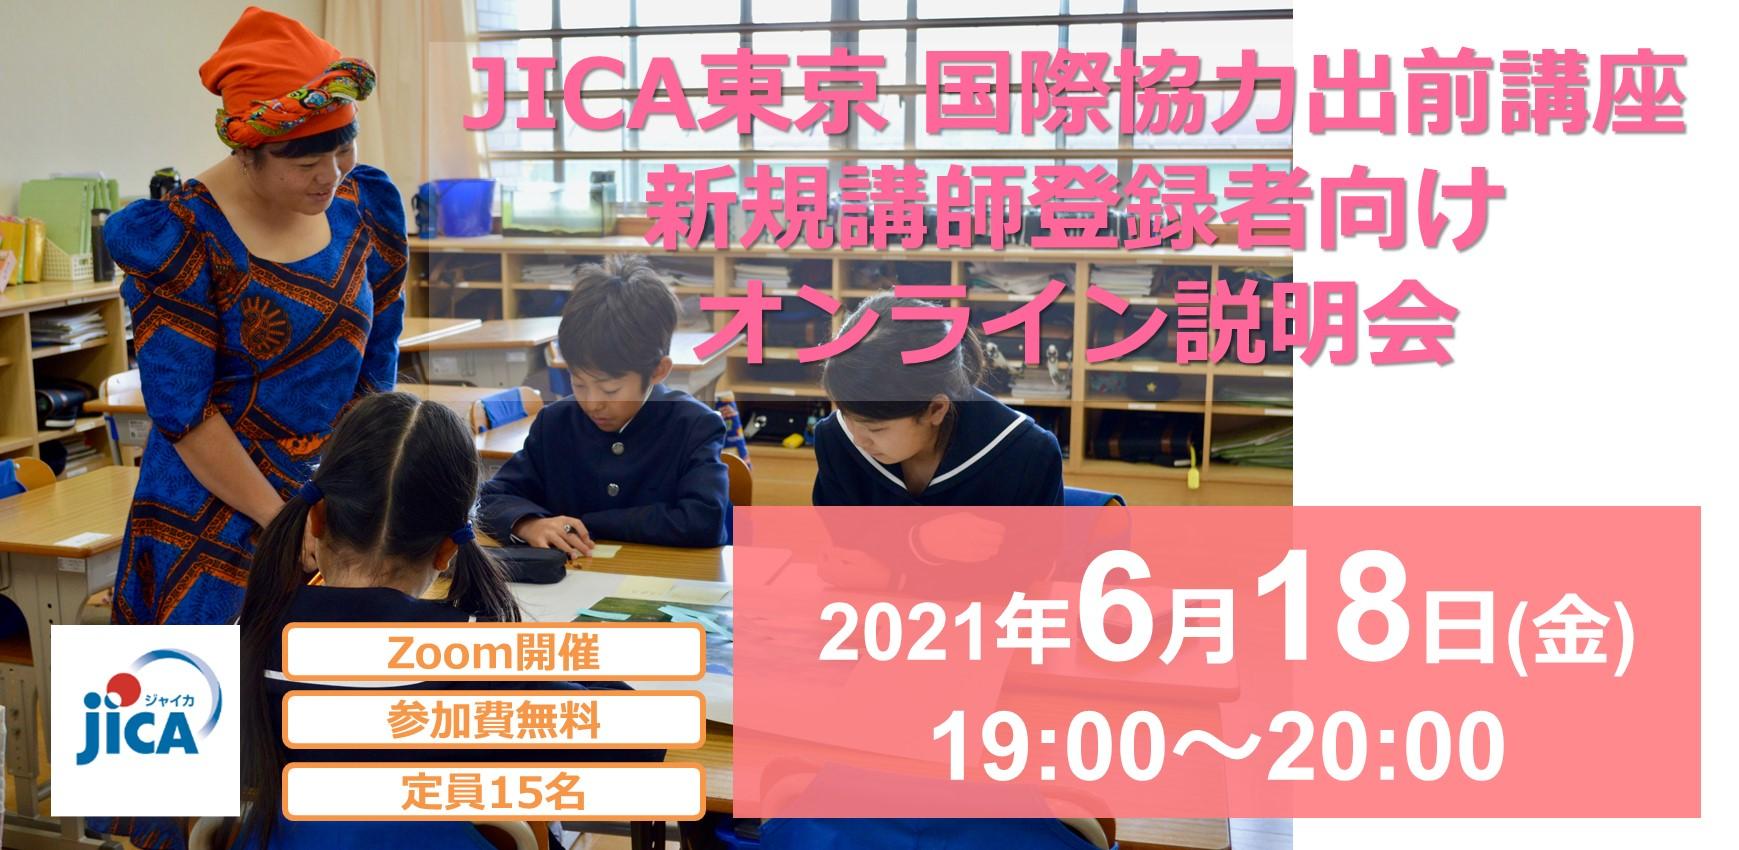 JICA東京 国際協力出前講座 新規講師向けオンライン説明会を開催します